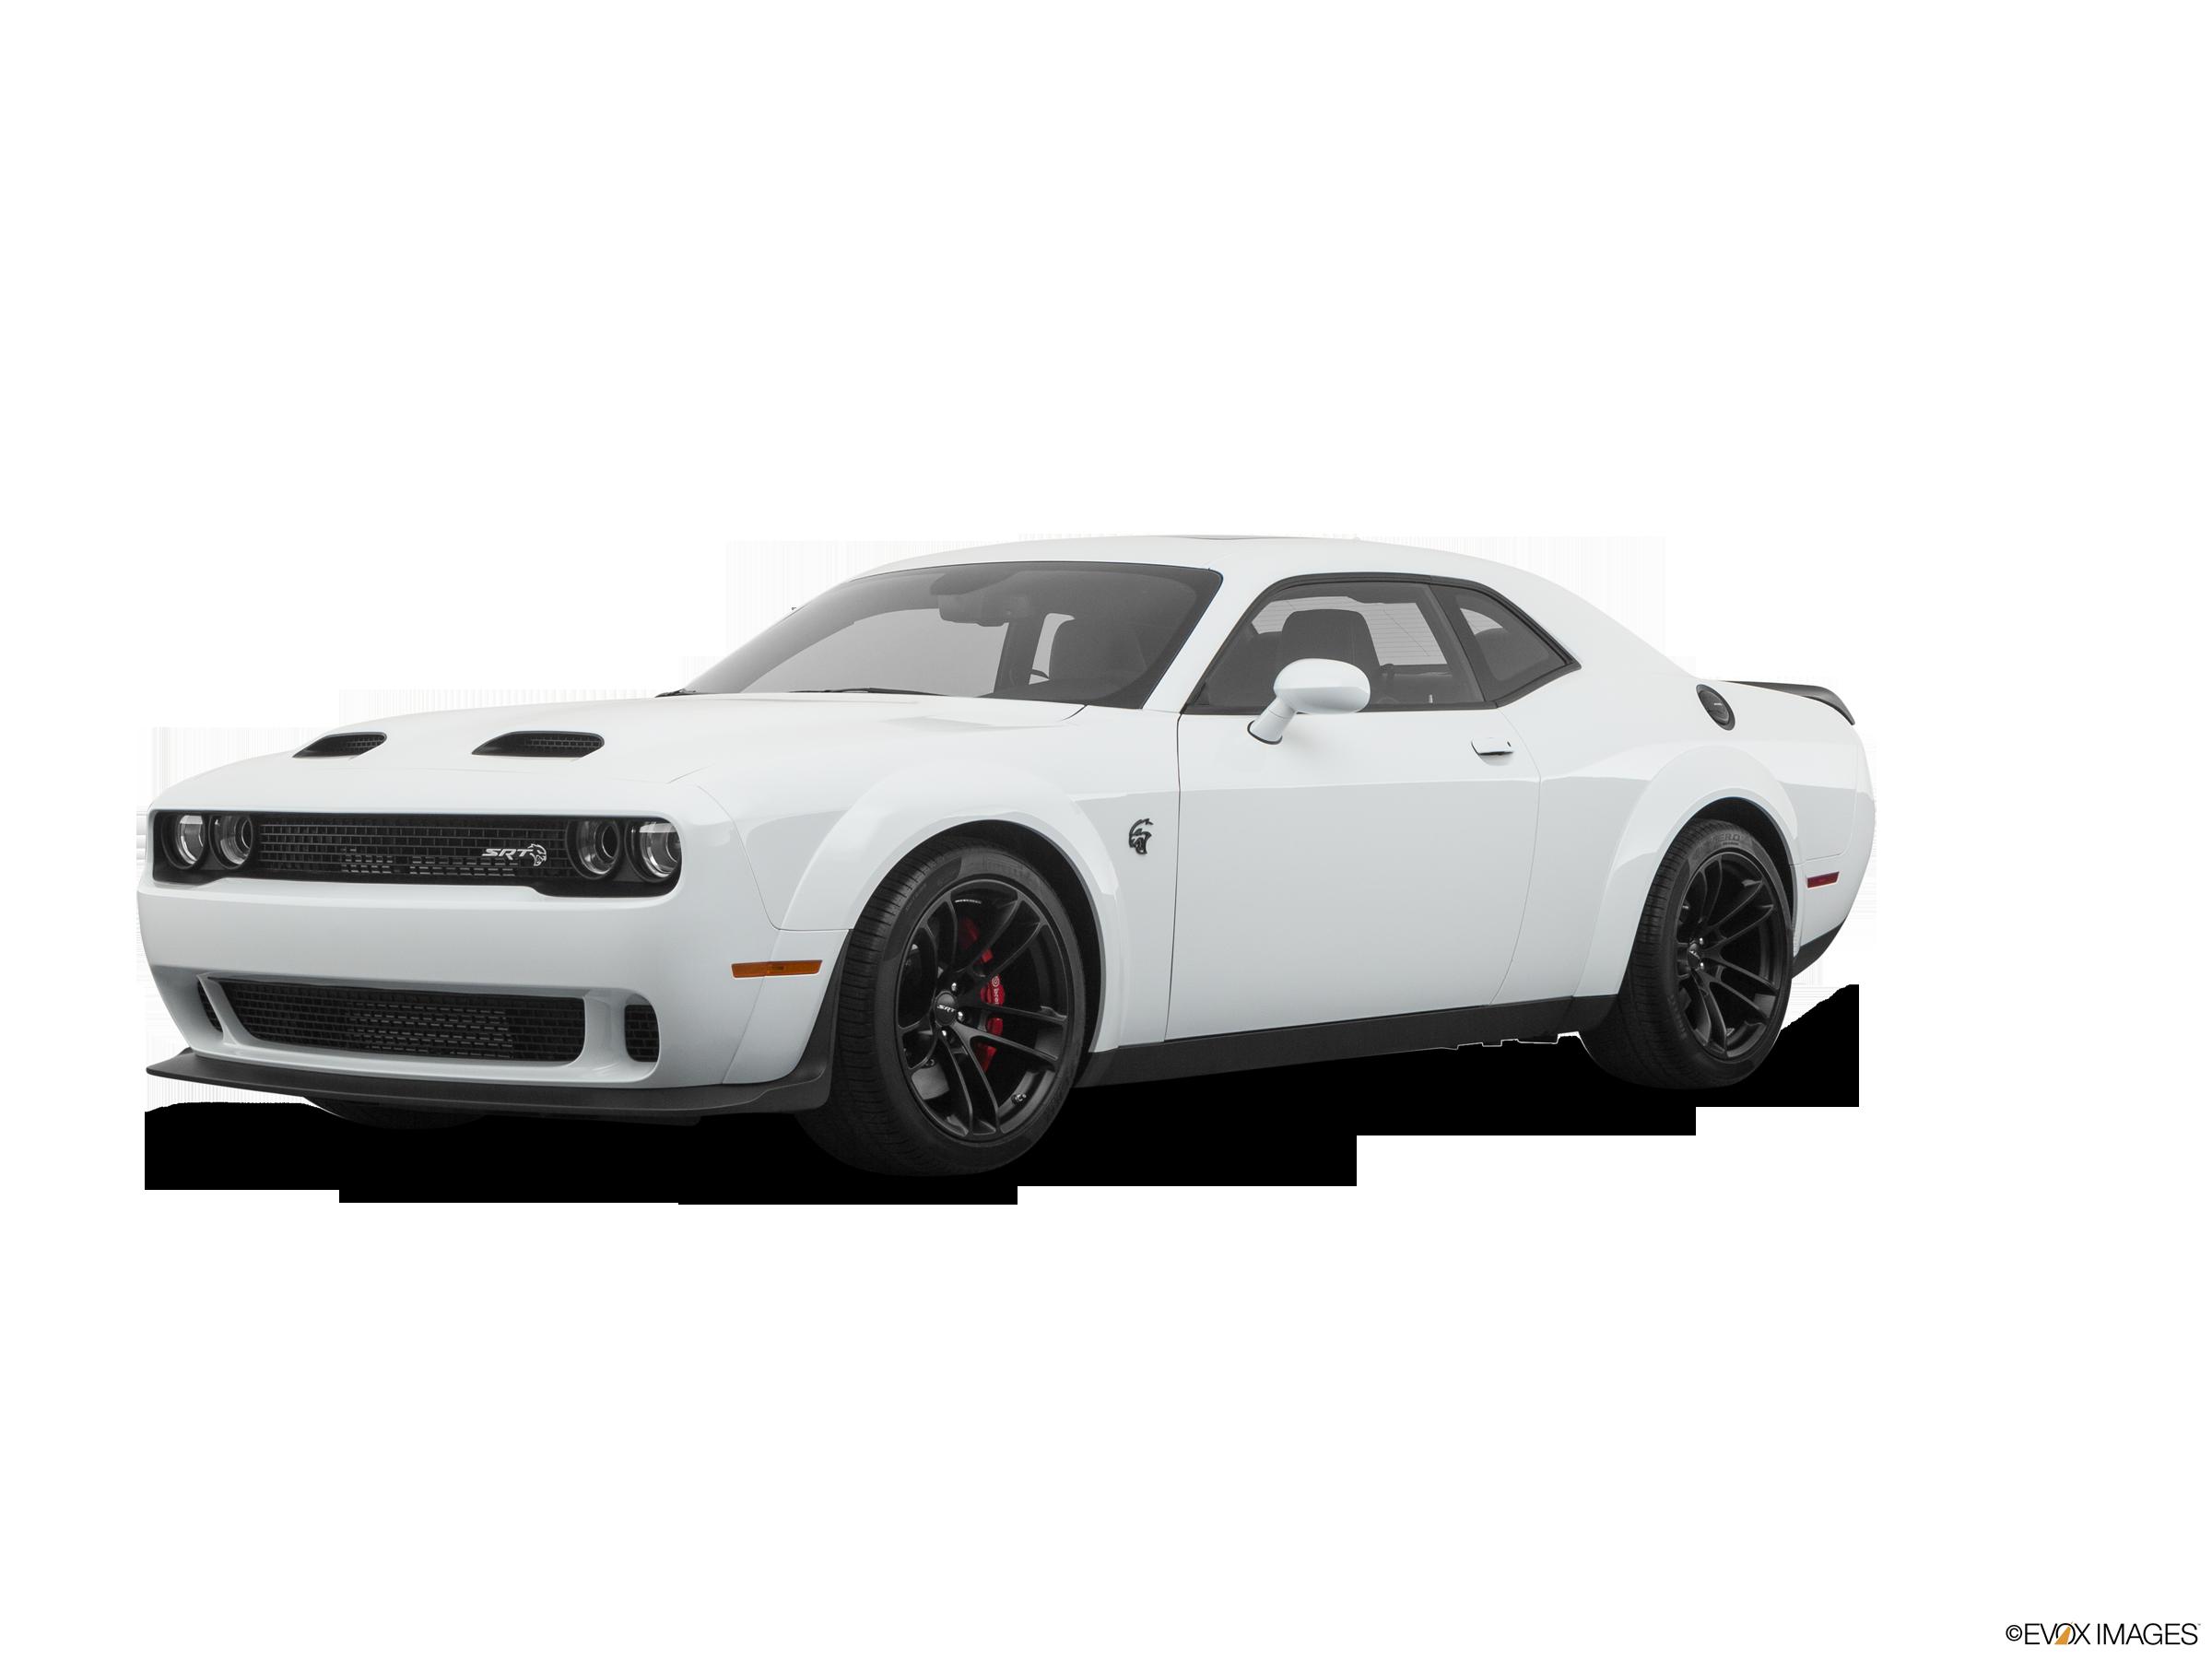 New 2020 Dodge Challenger Srt Hellcat Redeye Widebody Prices Kelley Blue Book